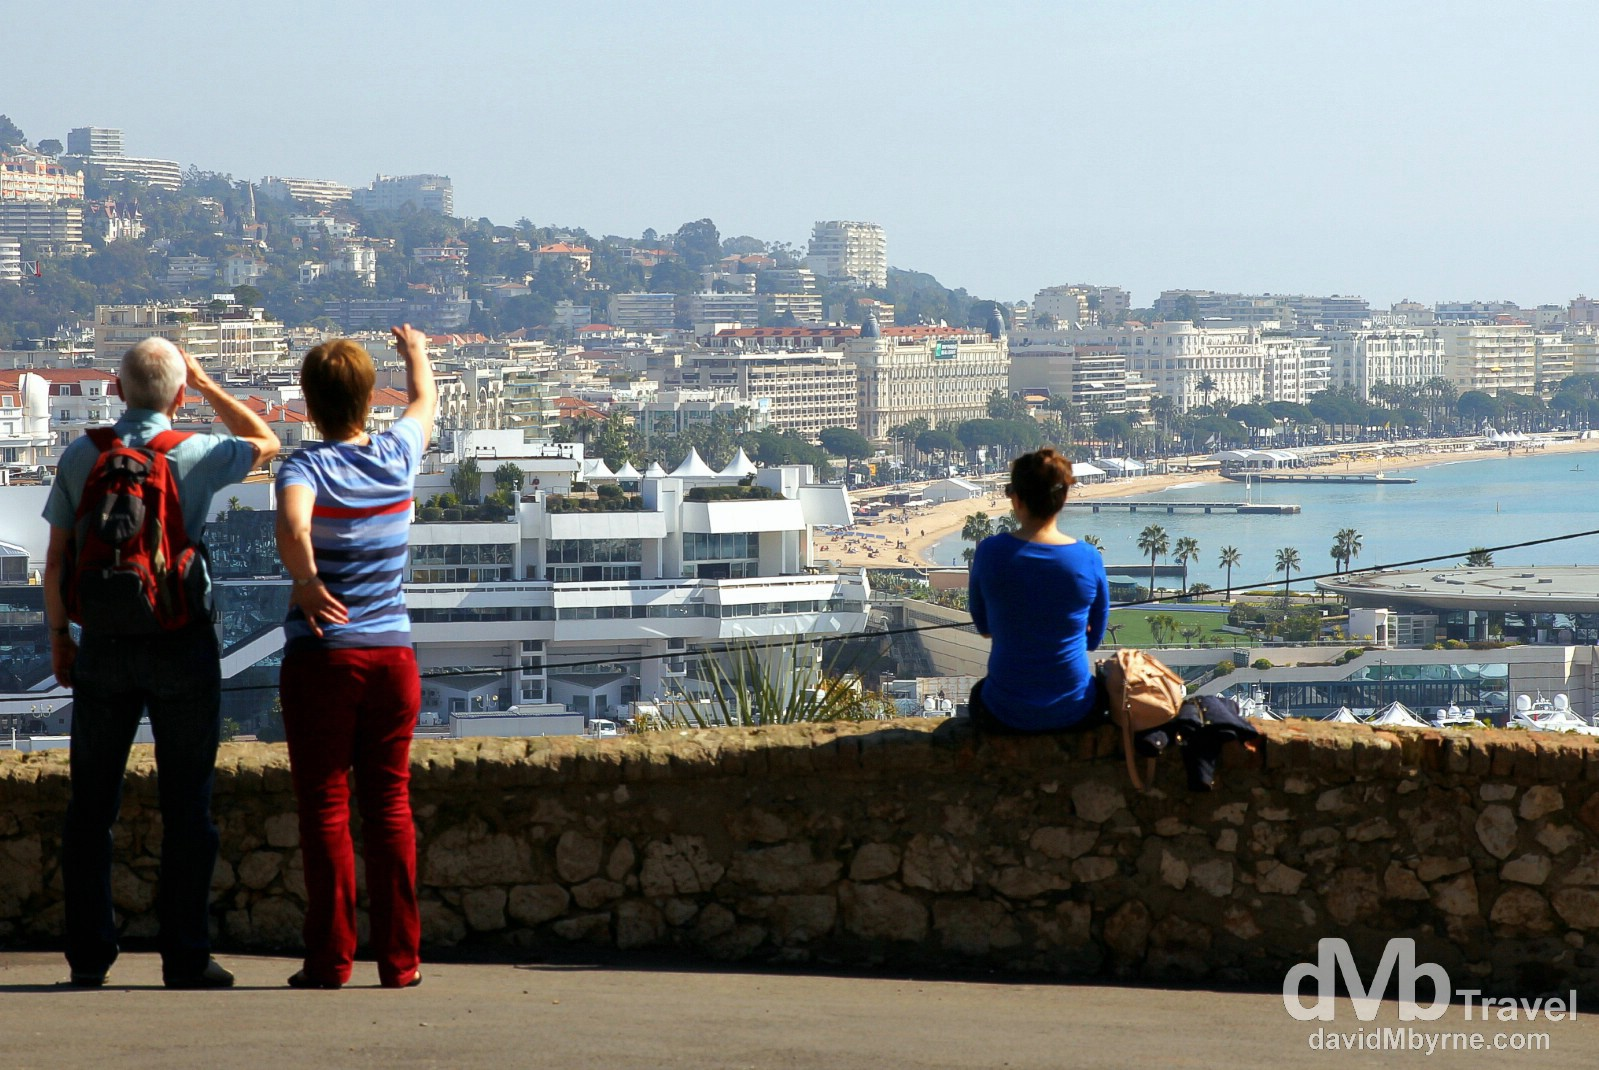 Viewing the Baie de Cannes from Le Suquet (Old Town), Cannes, Côte d'Azur, France. March 15th, 2014.